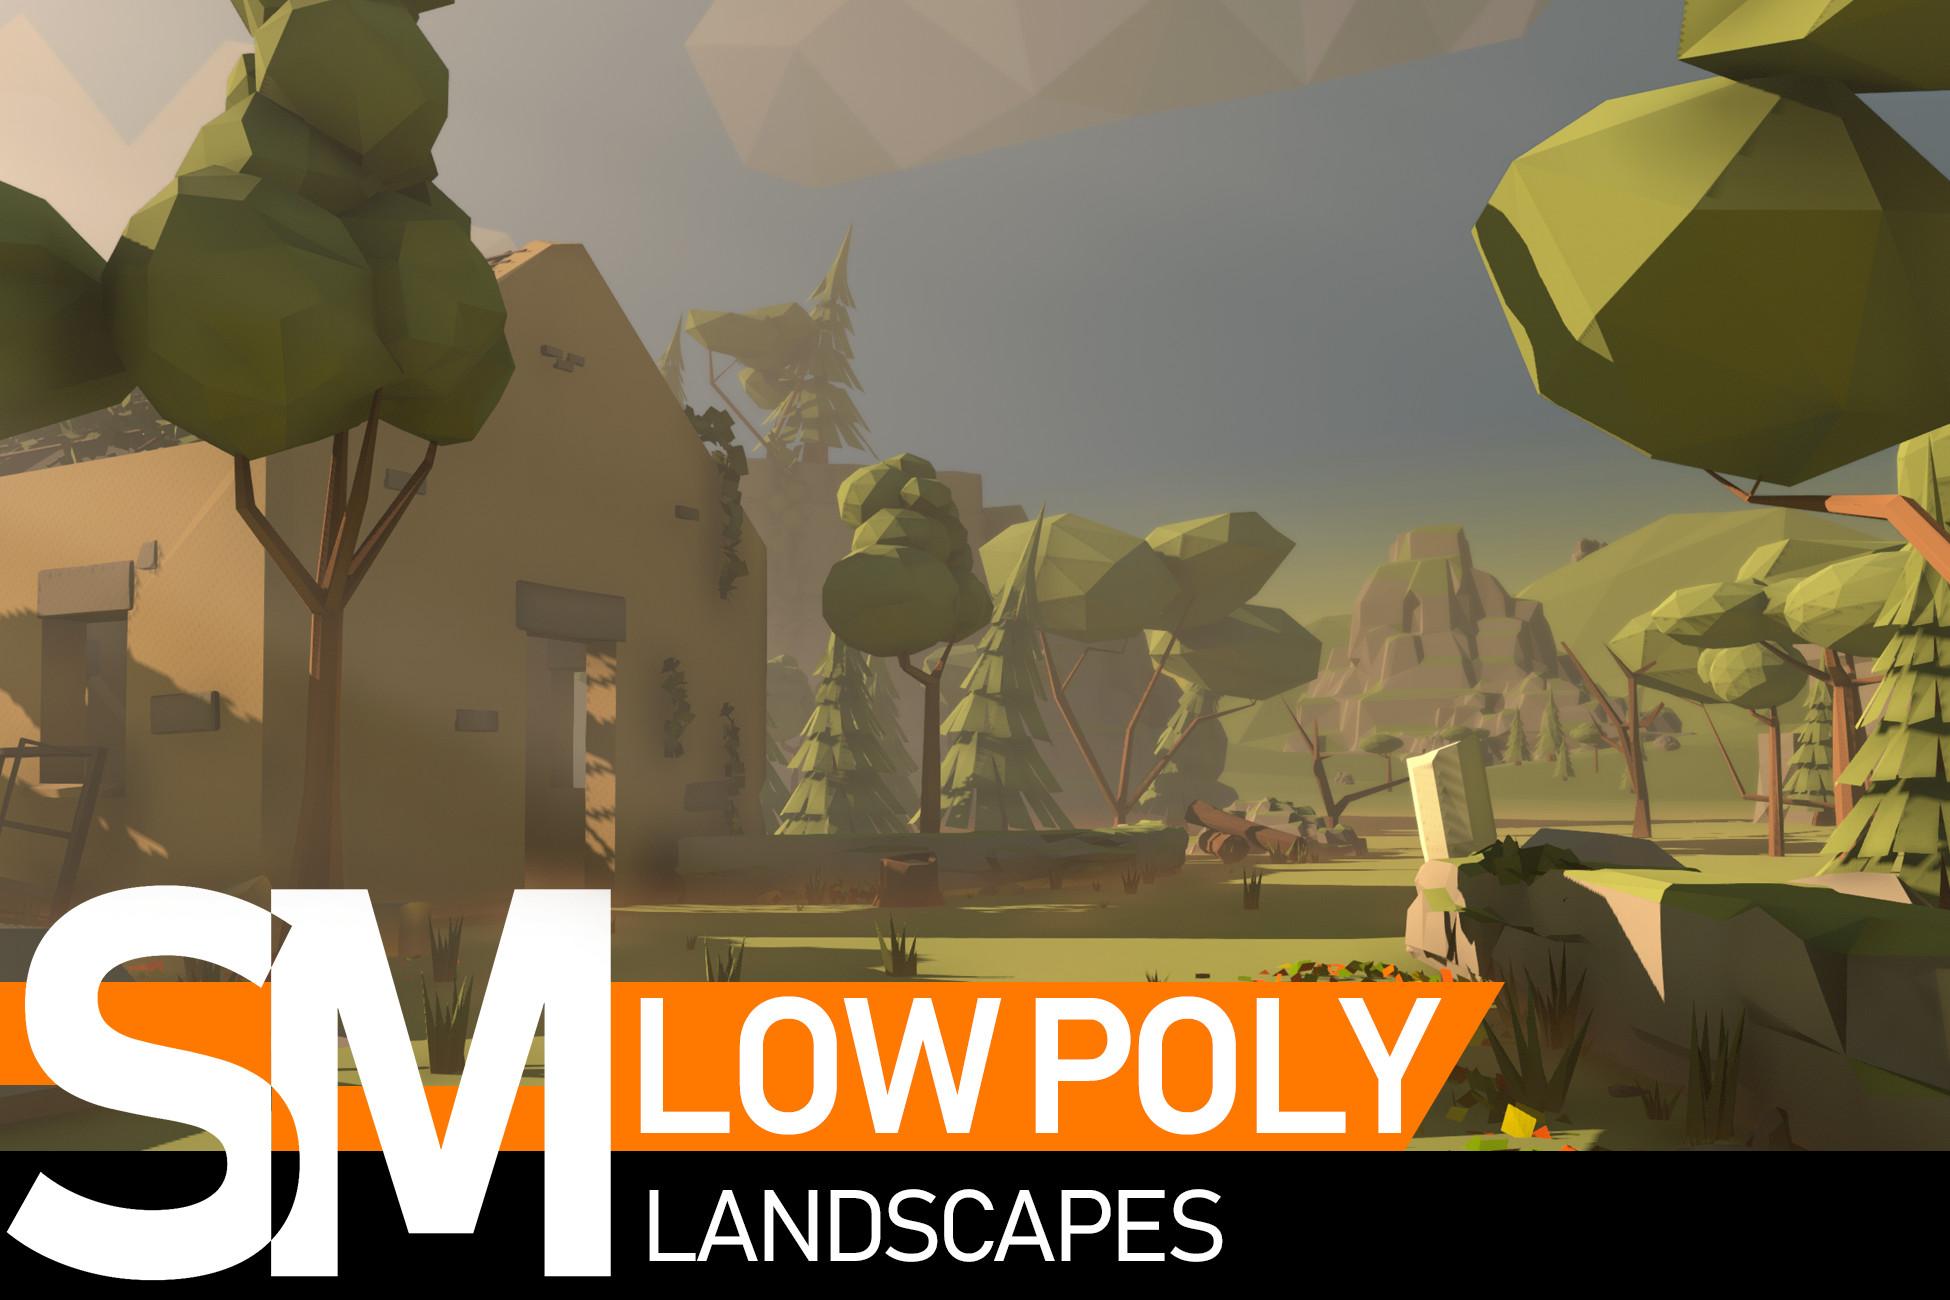 Low Poly Landscapes